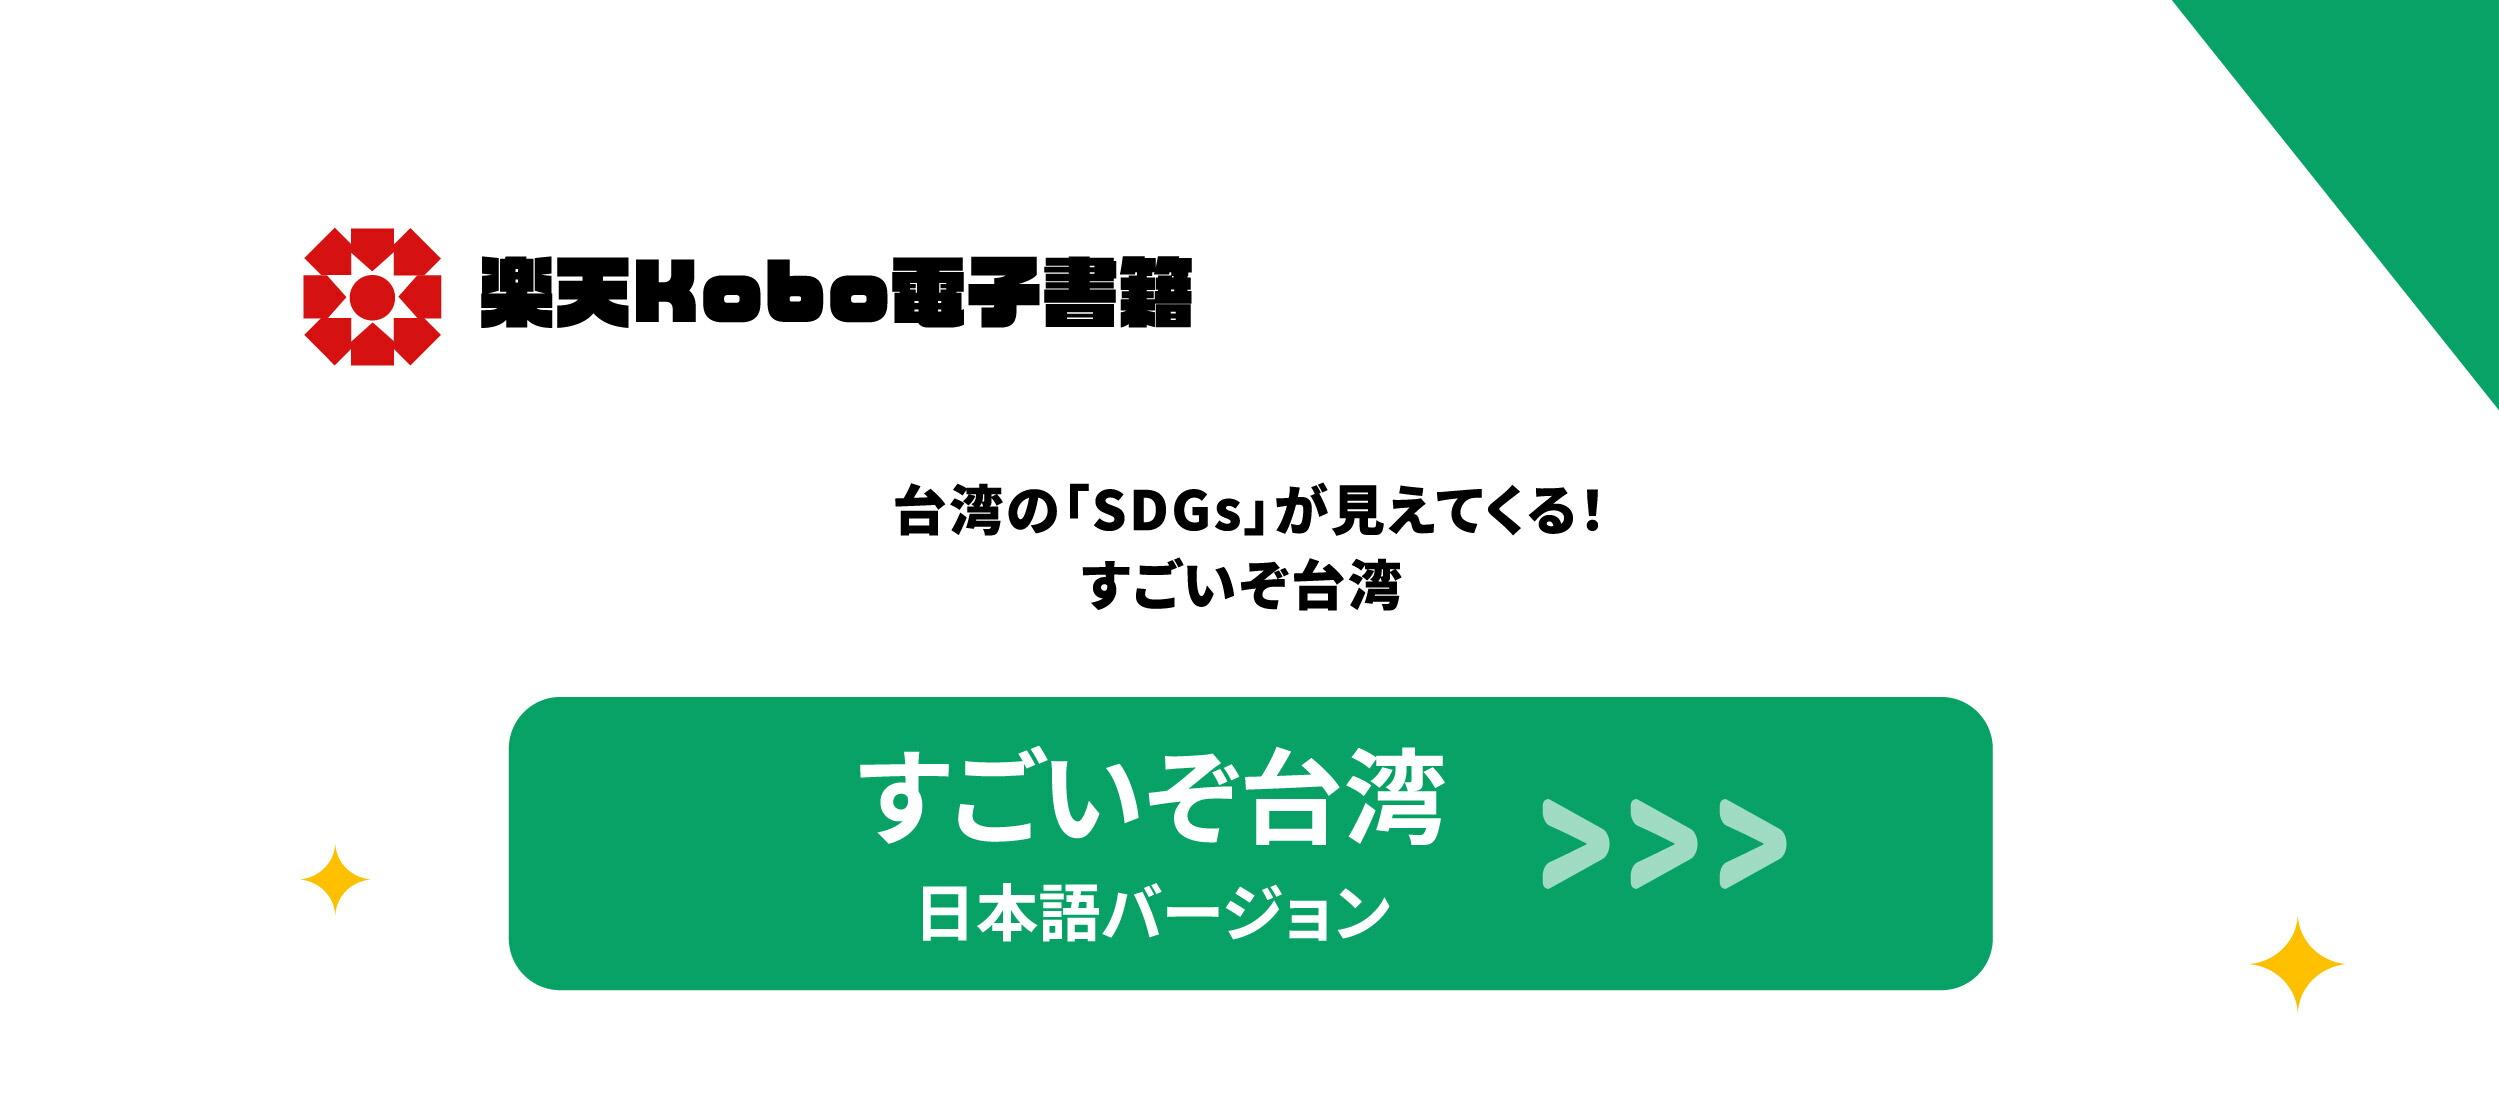 kobo 楽天kobo 台湾エクセレンス すごいぞ台湾 台湾